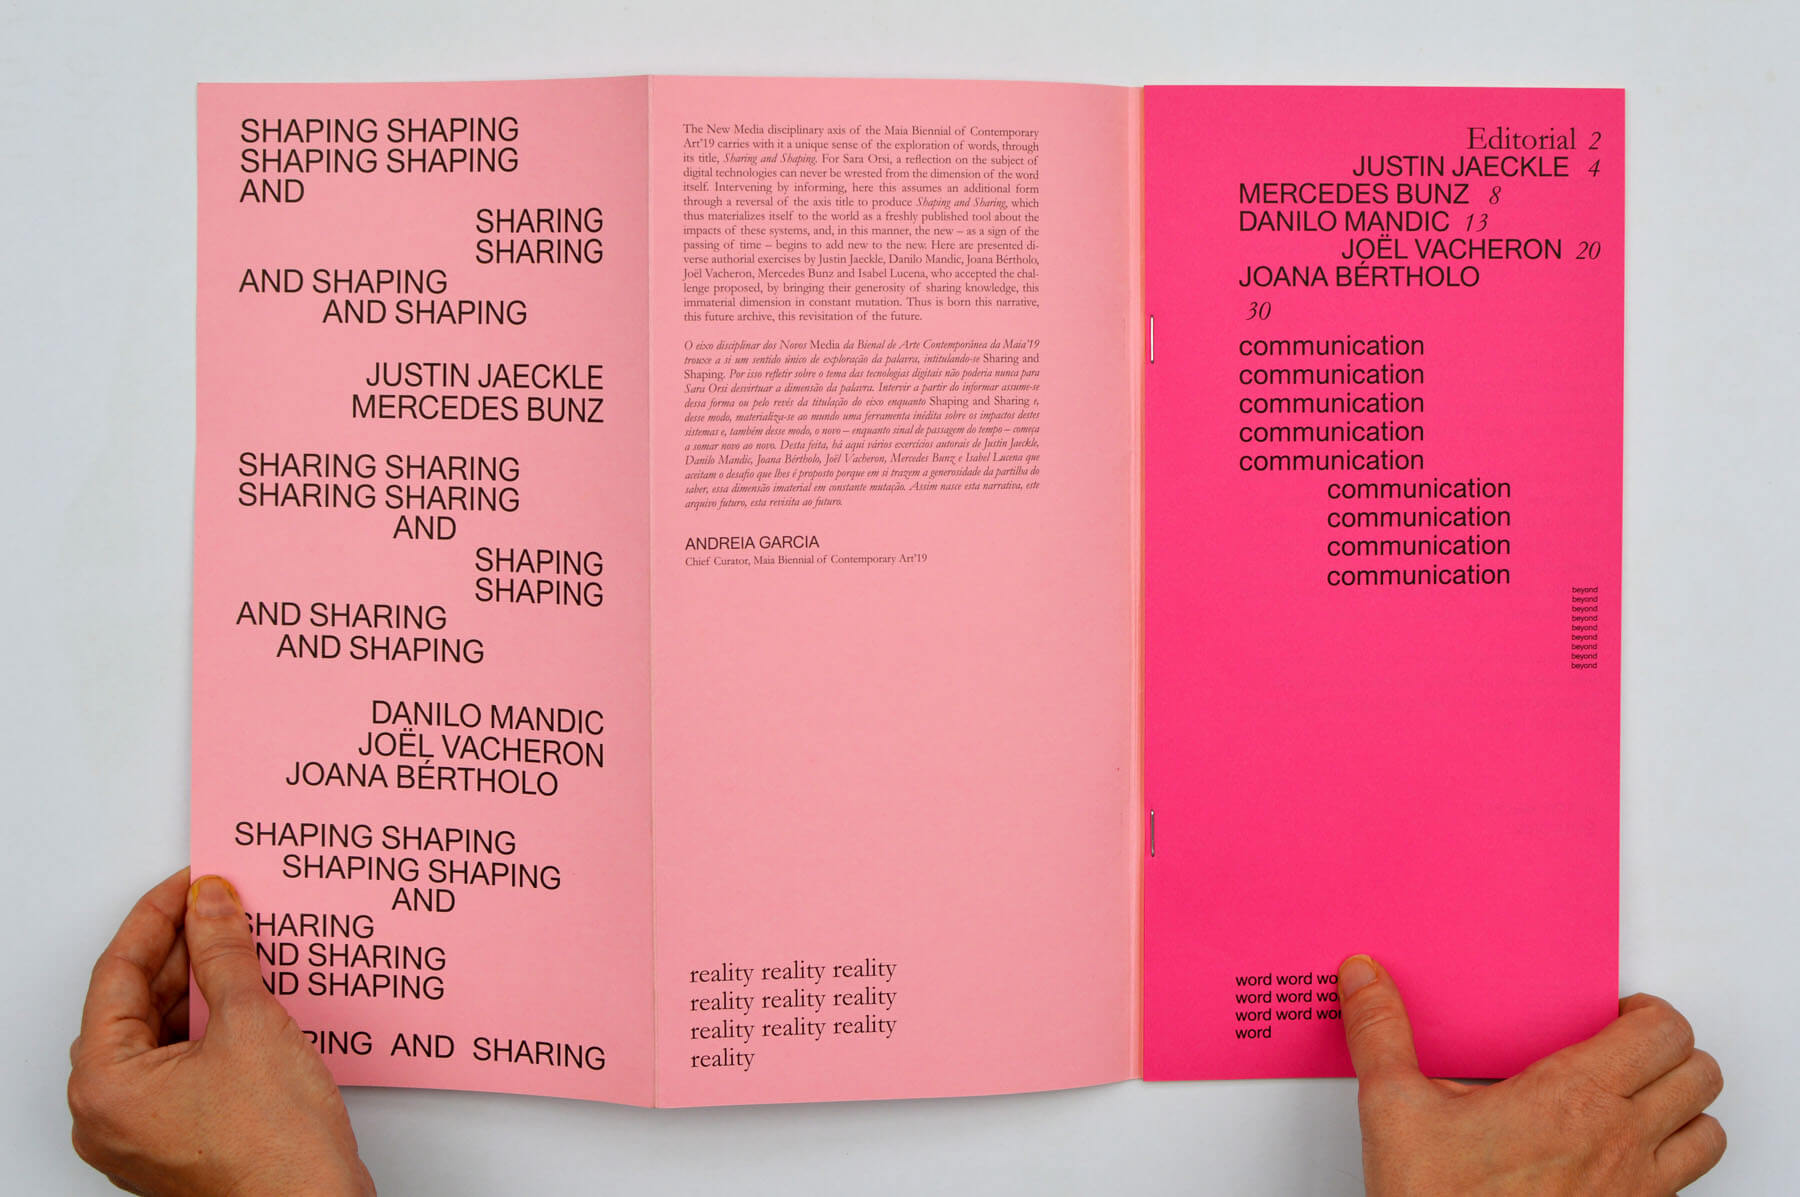 shaping and sharing isabel lucena 03